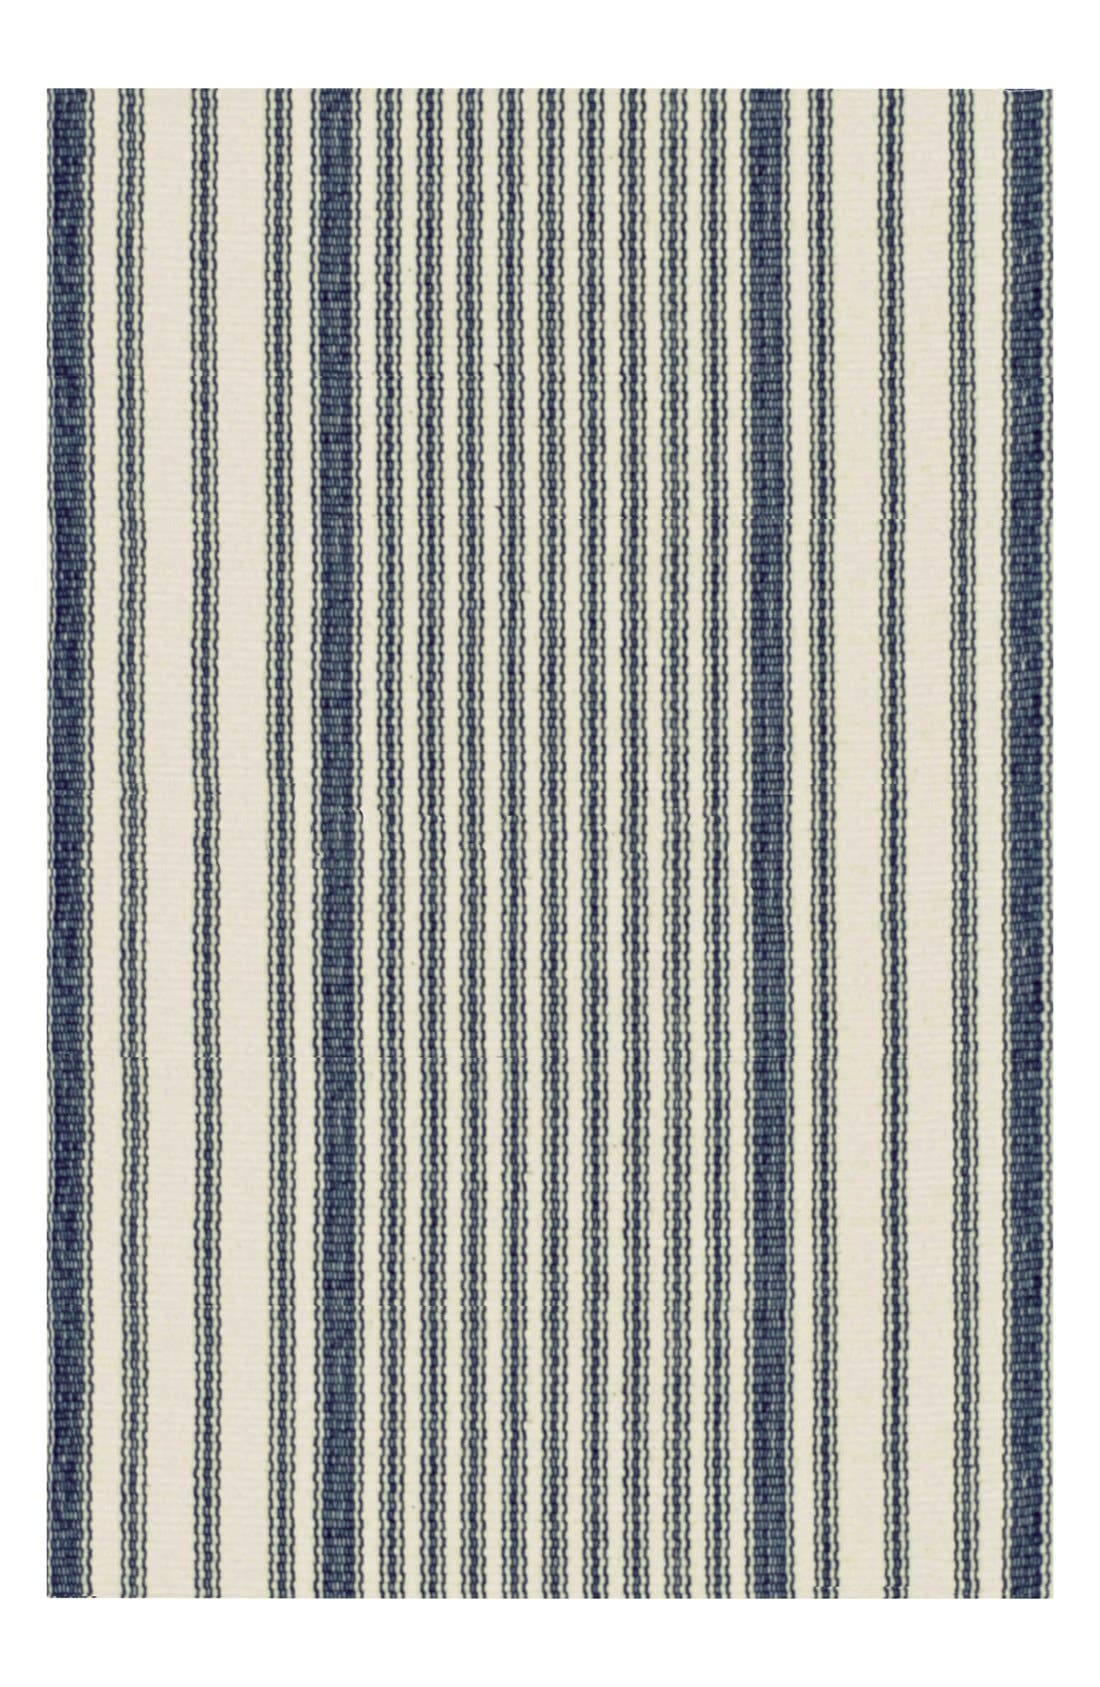 Stripe Ticking Rug,                             Main thumbnail 1, color,                             BLUE/ MULTI